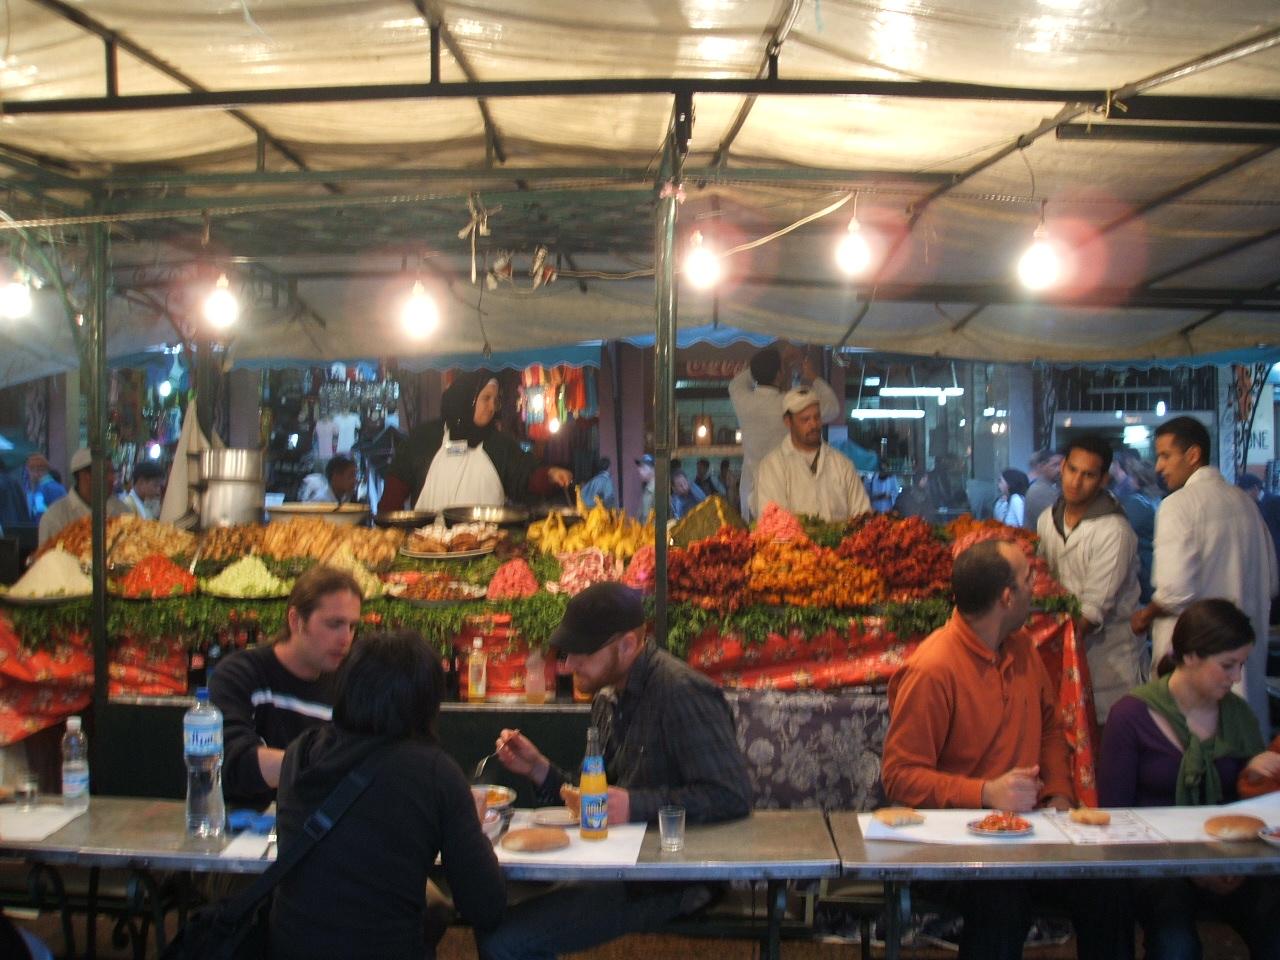 Djeema el Fna - No 1 food stall